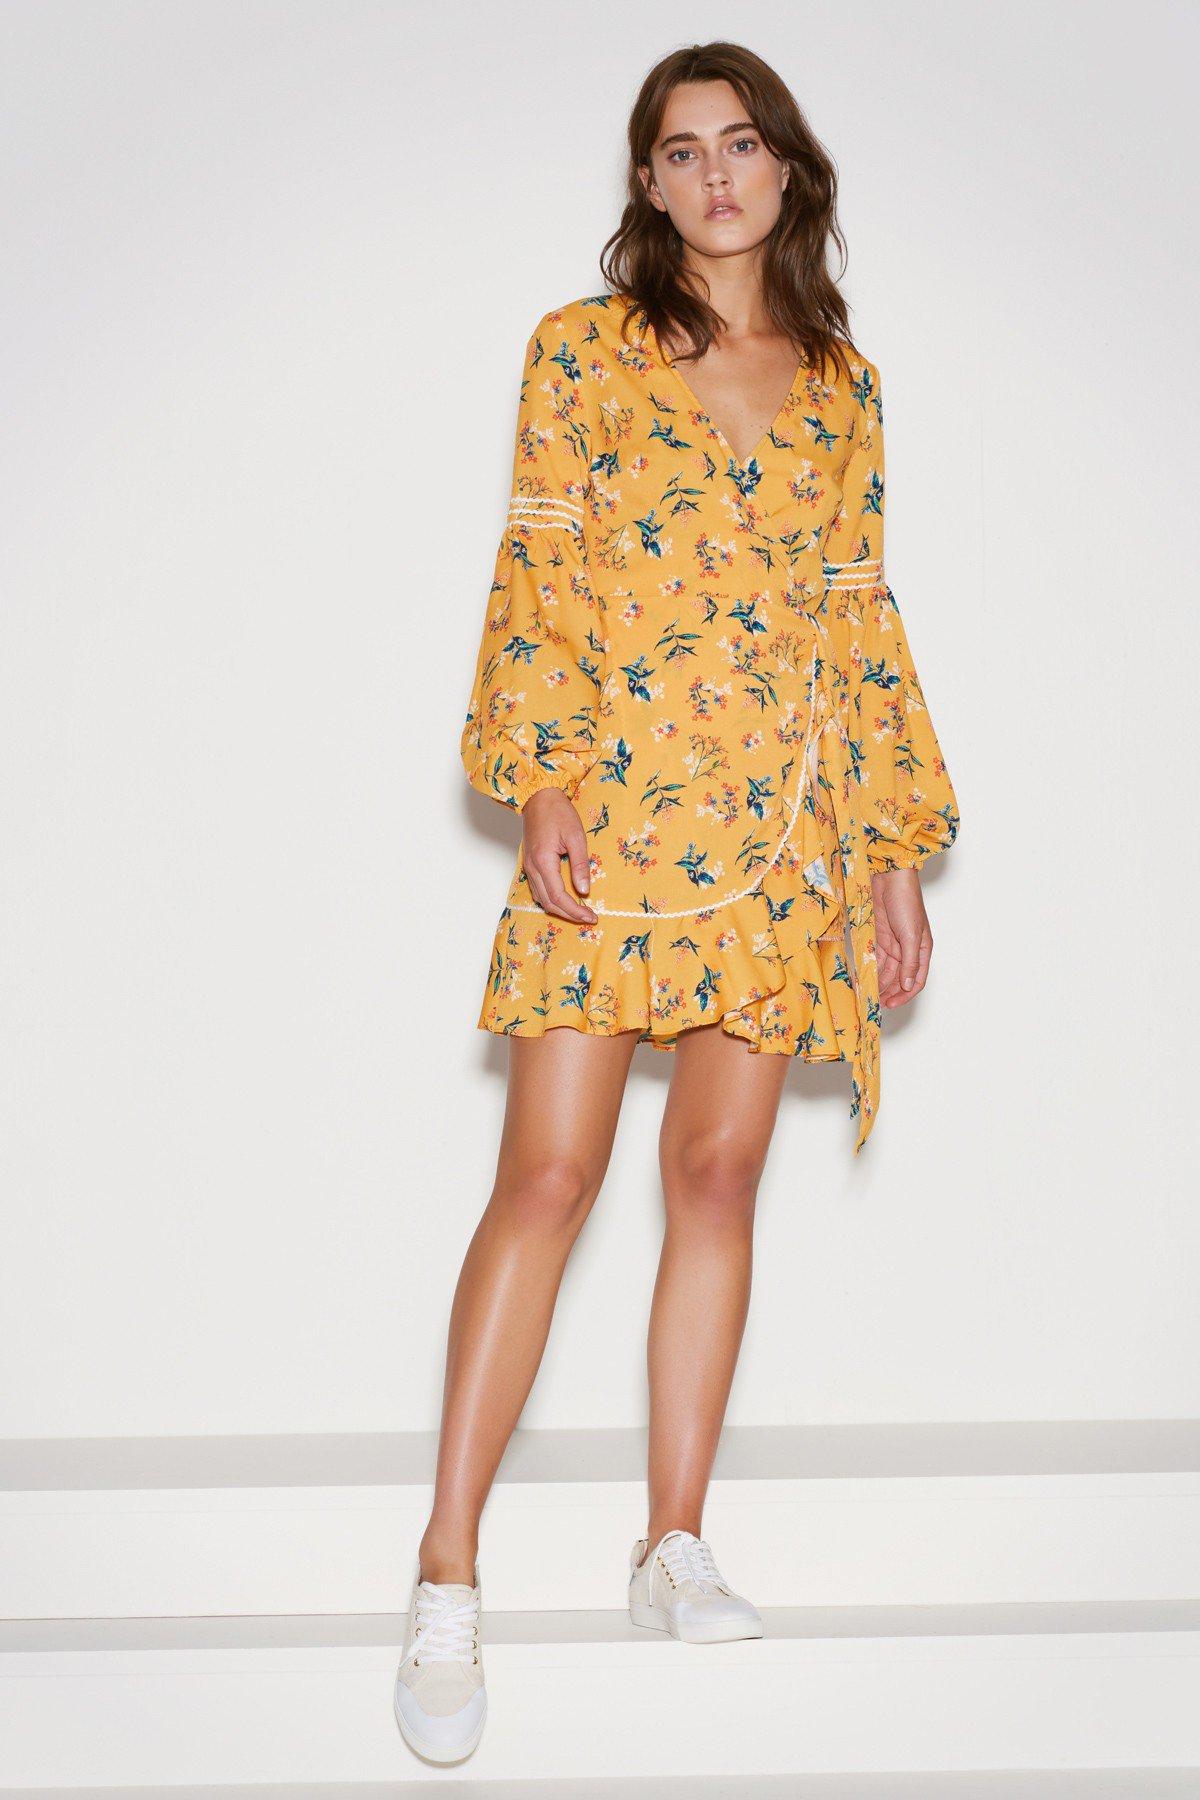 The Fifth Label Skyward Dress